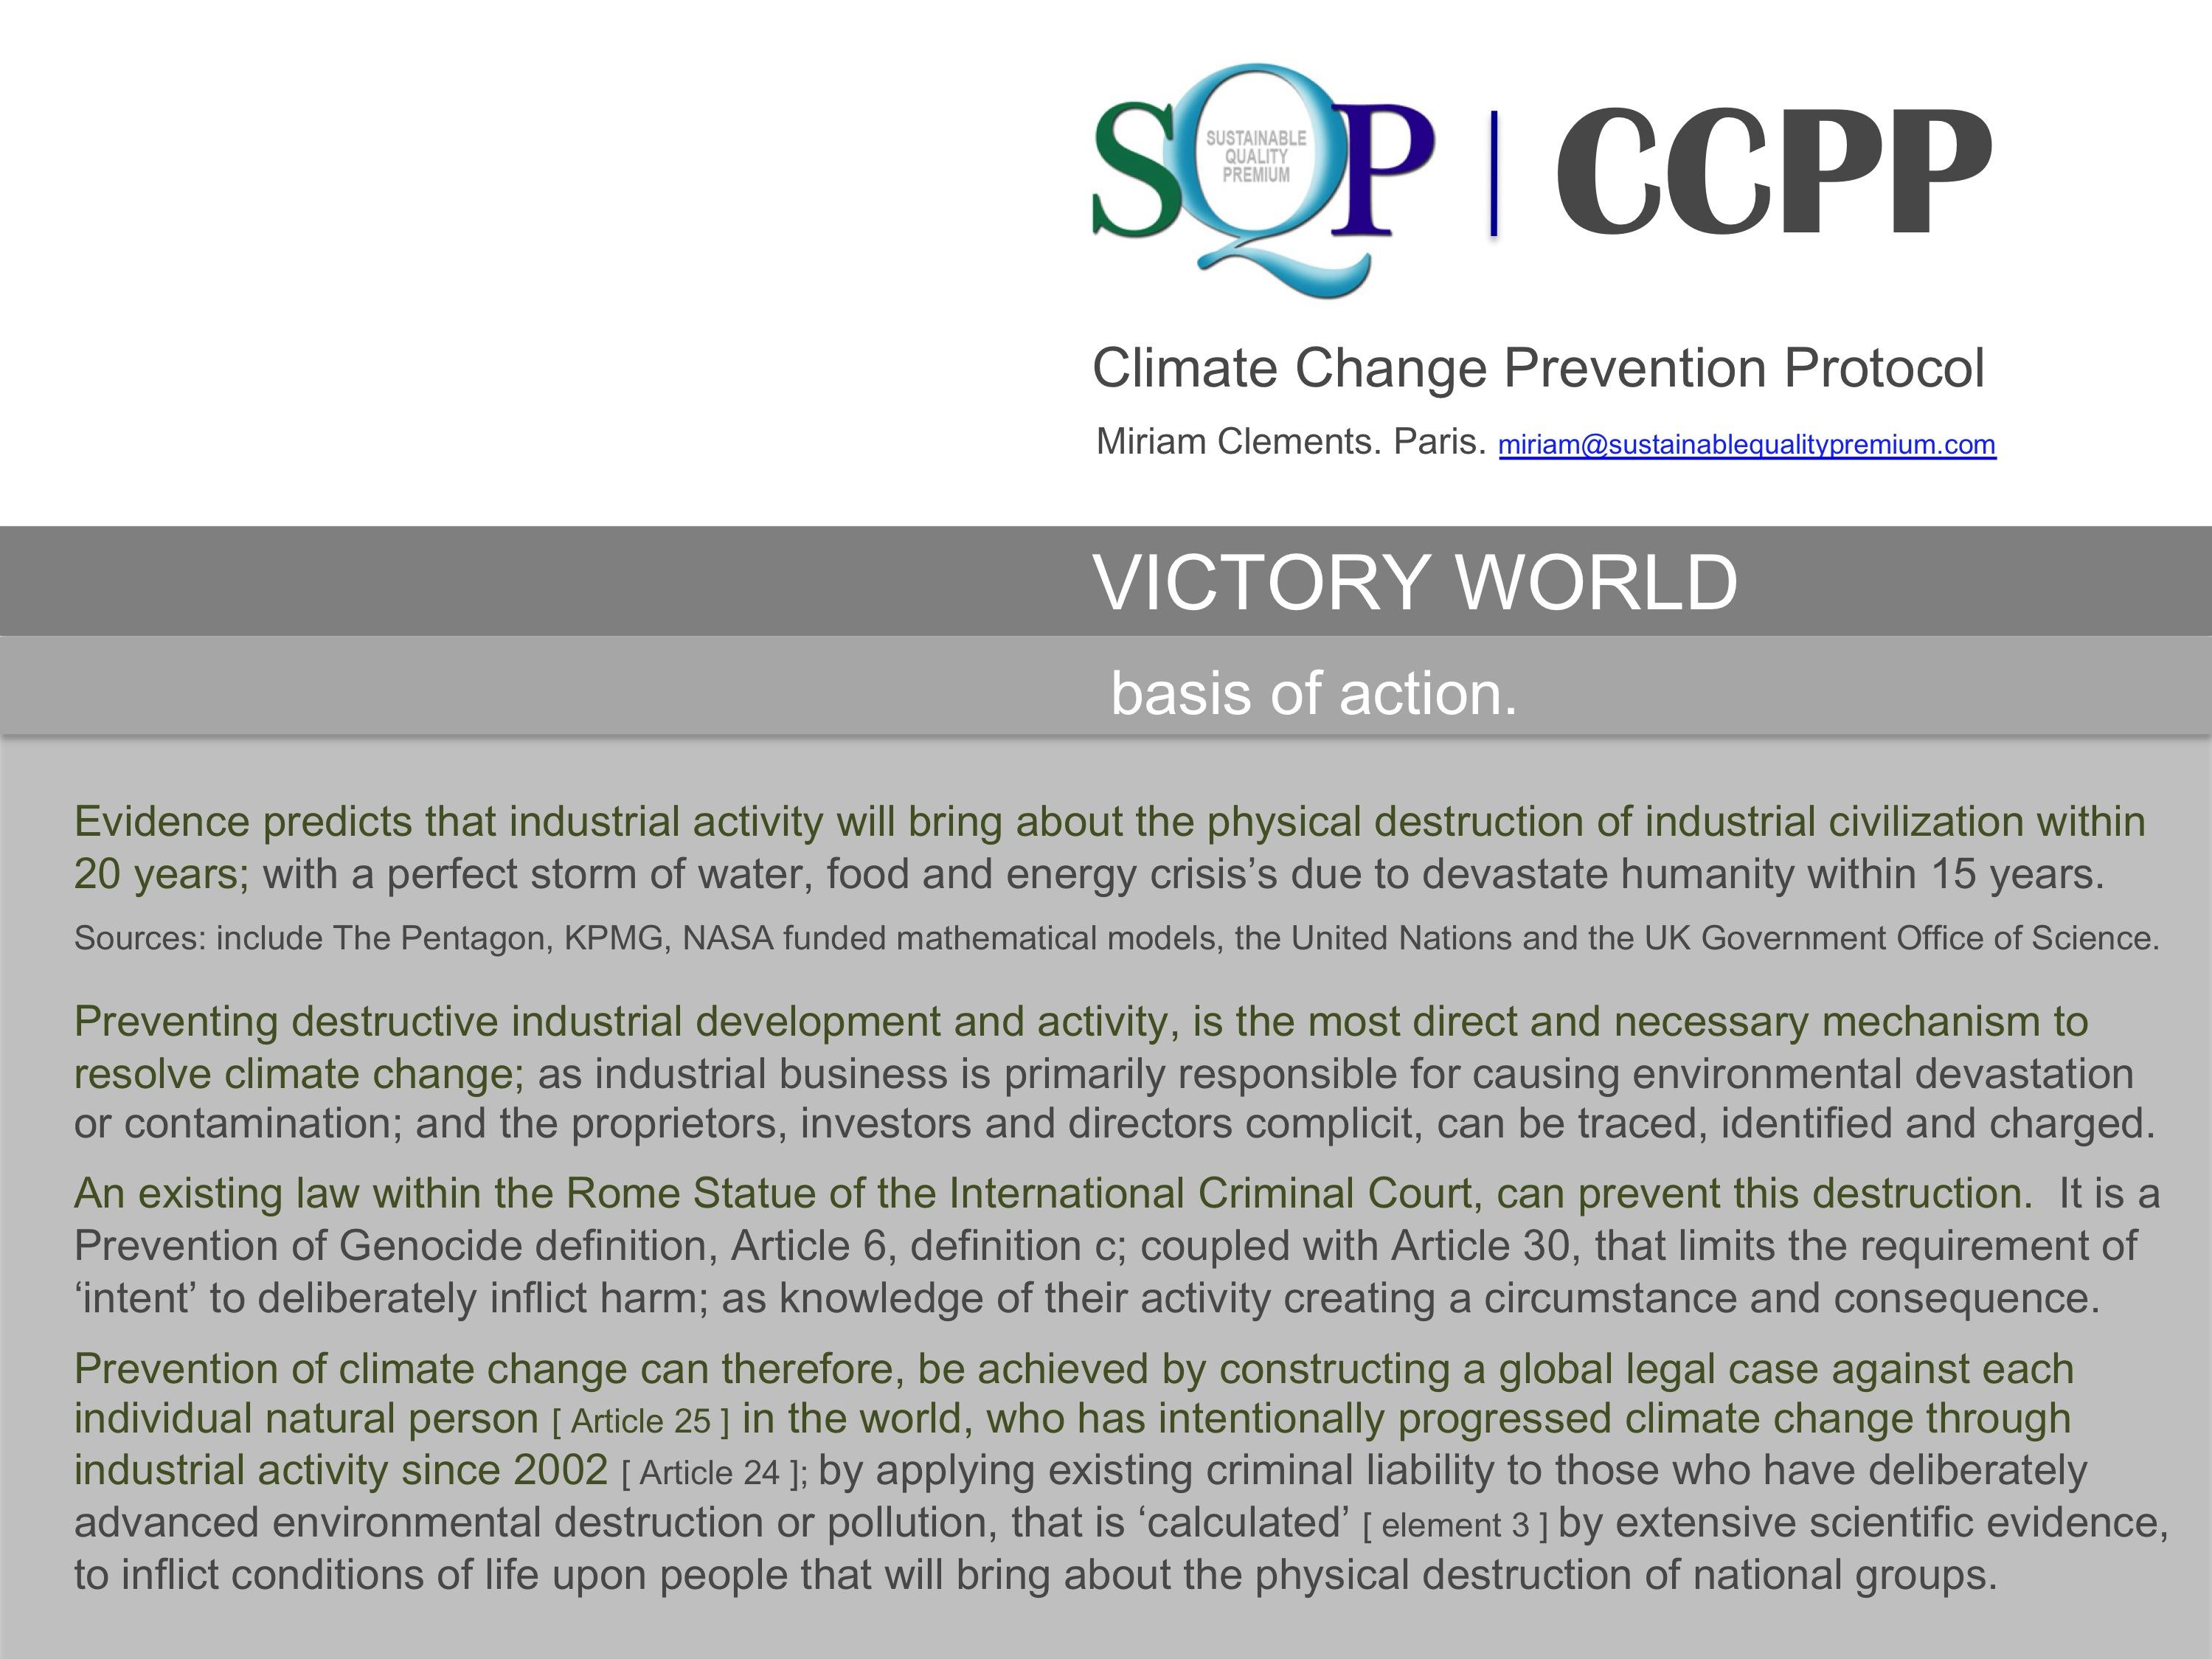 SQP CCPP Basis of Action.